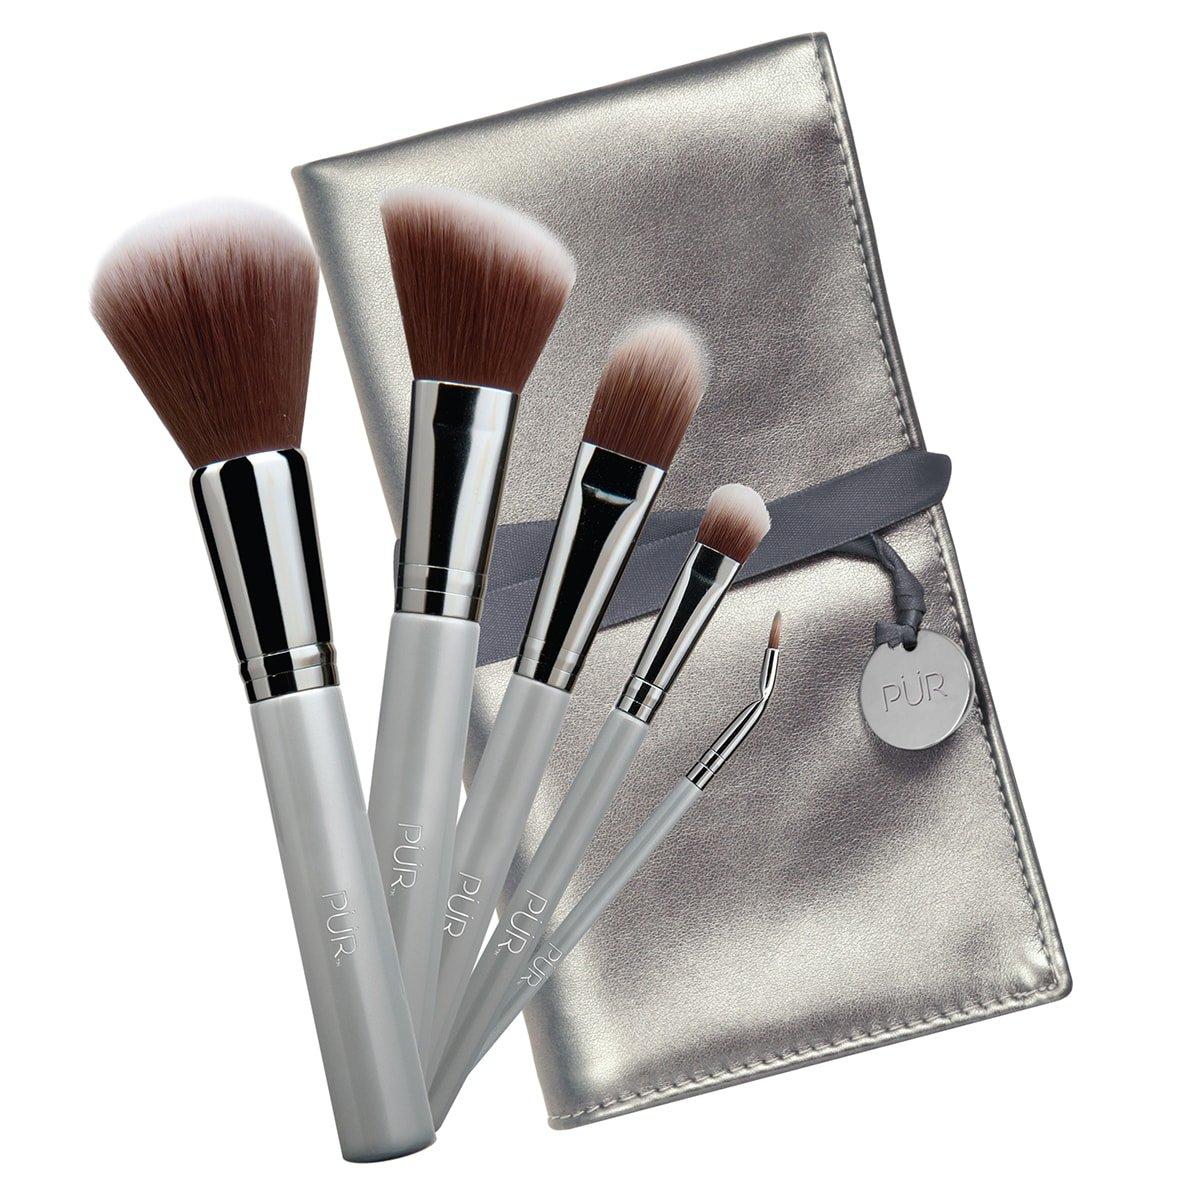 PÜR Pro Tools 5-Piece Brush Collection